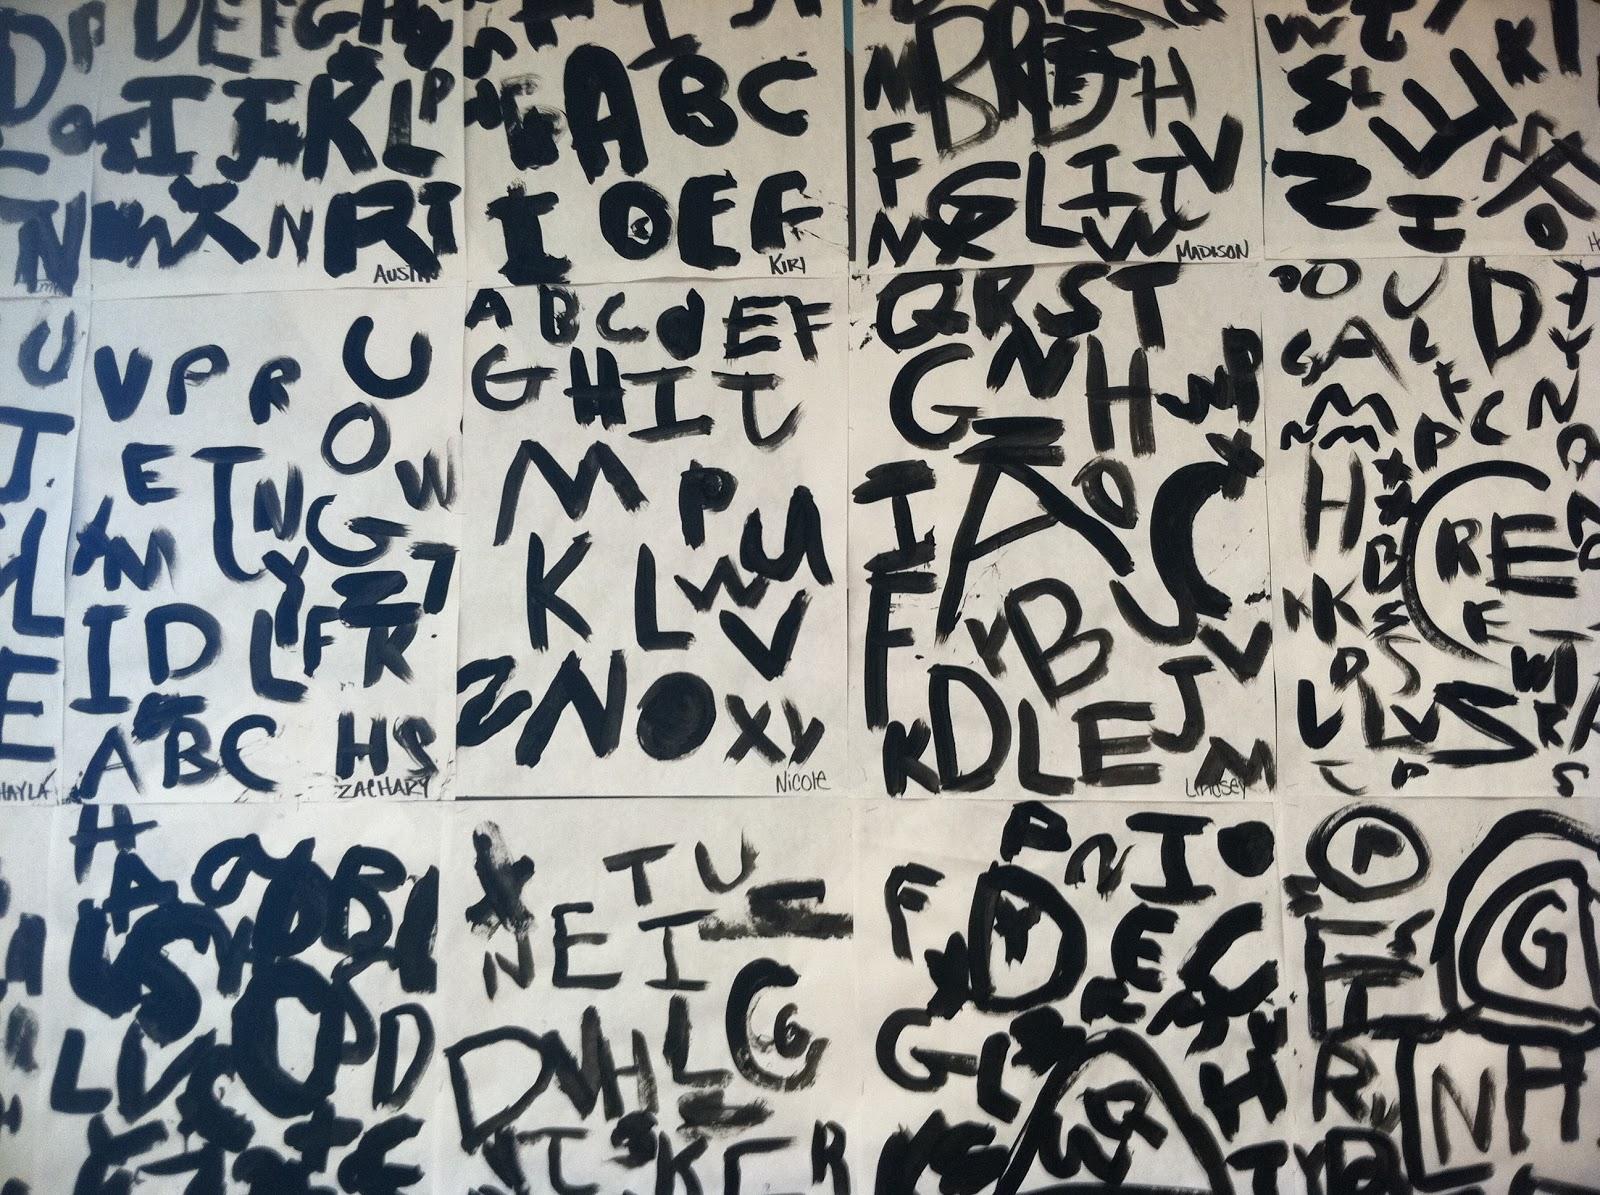 Olive Art Do You Alphabet Painting